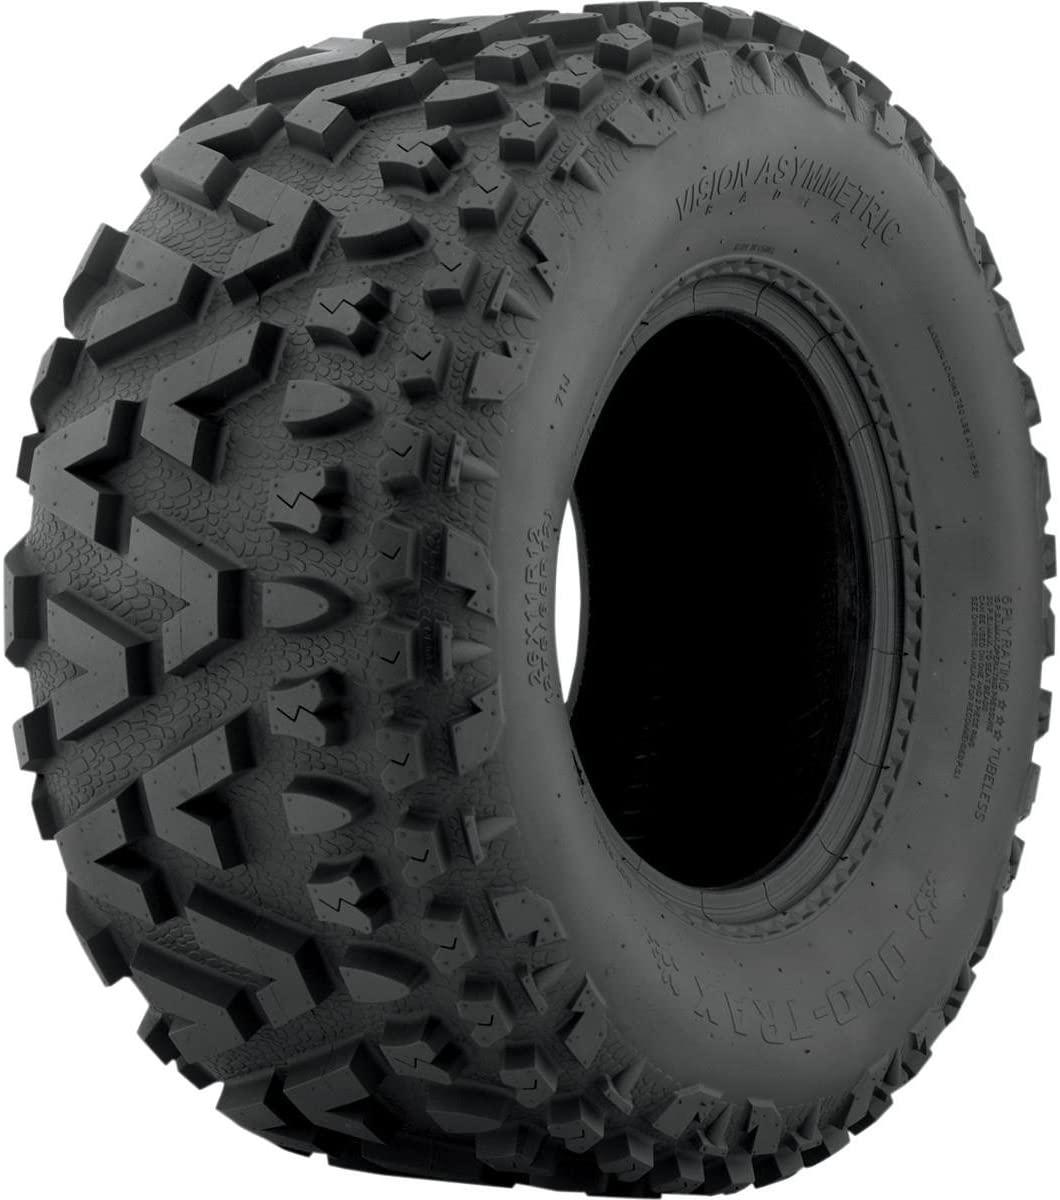 Vision Duo-Trax ATV Radial Tire - 26/9R12 65J